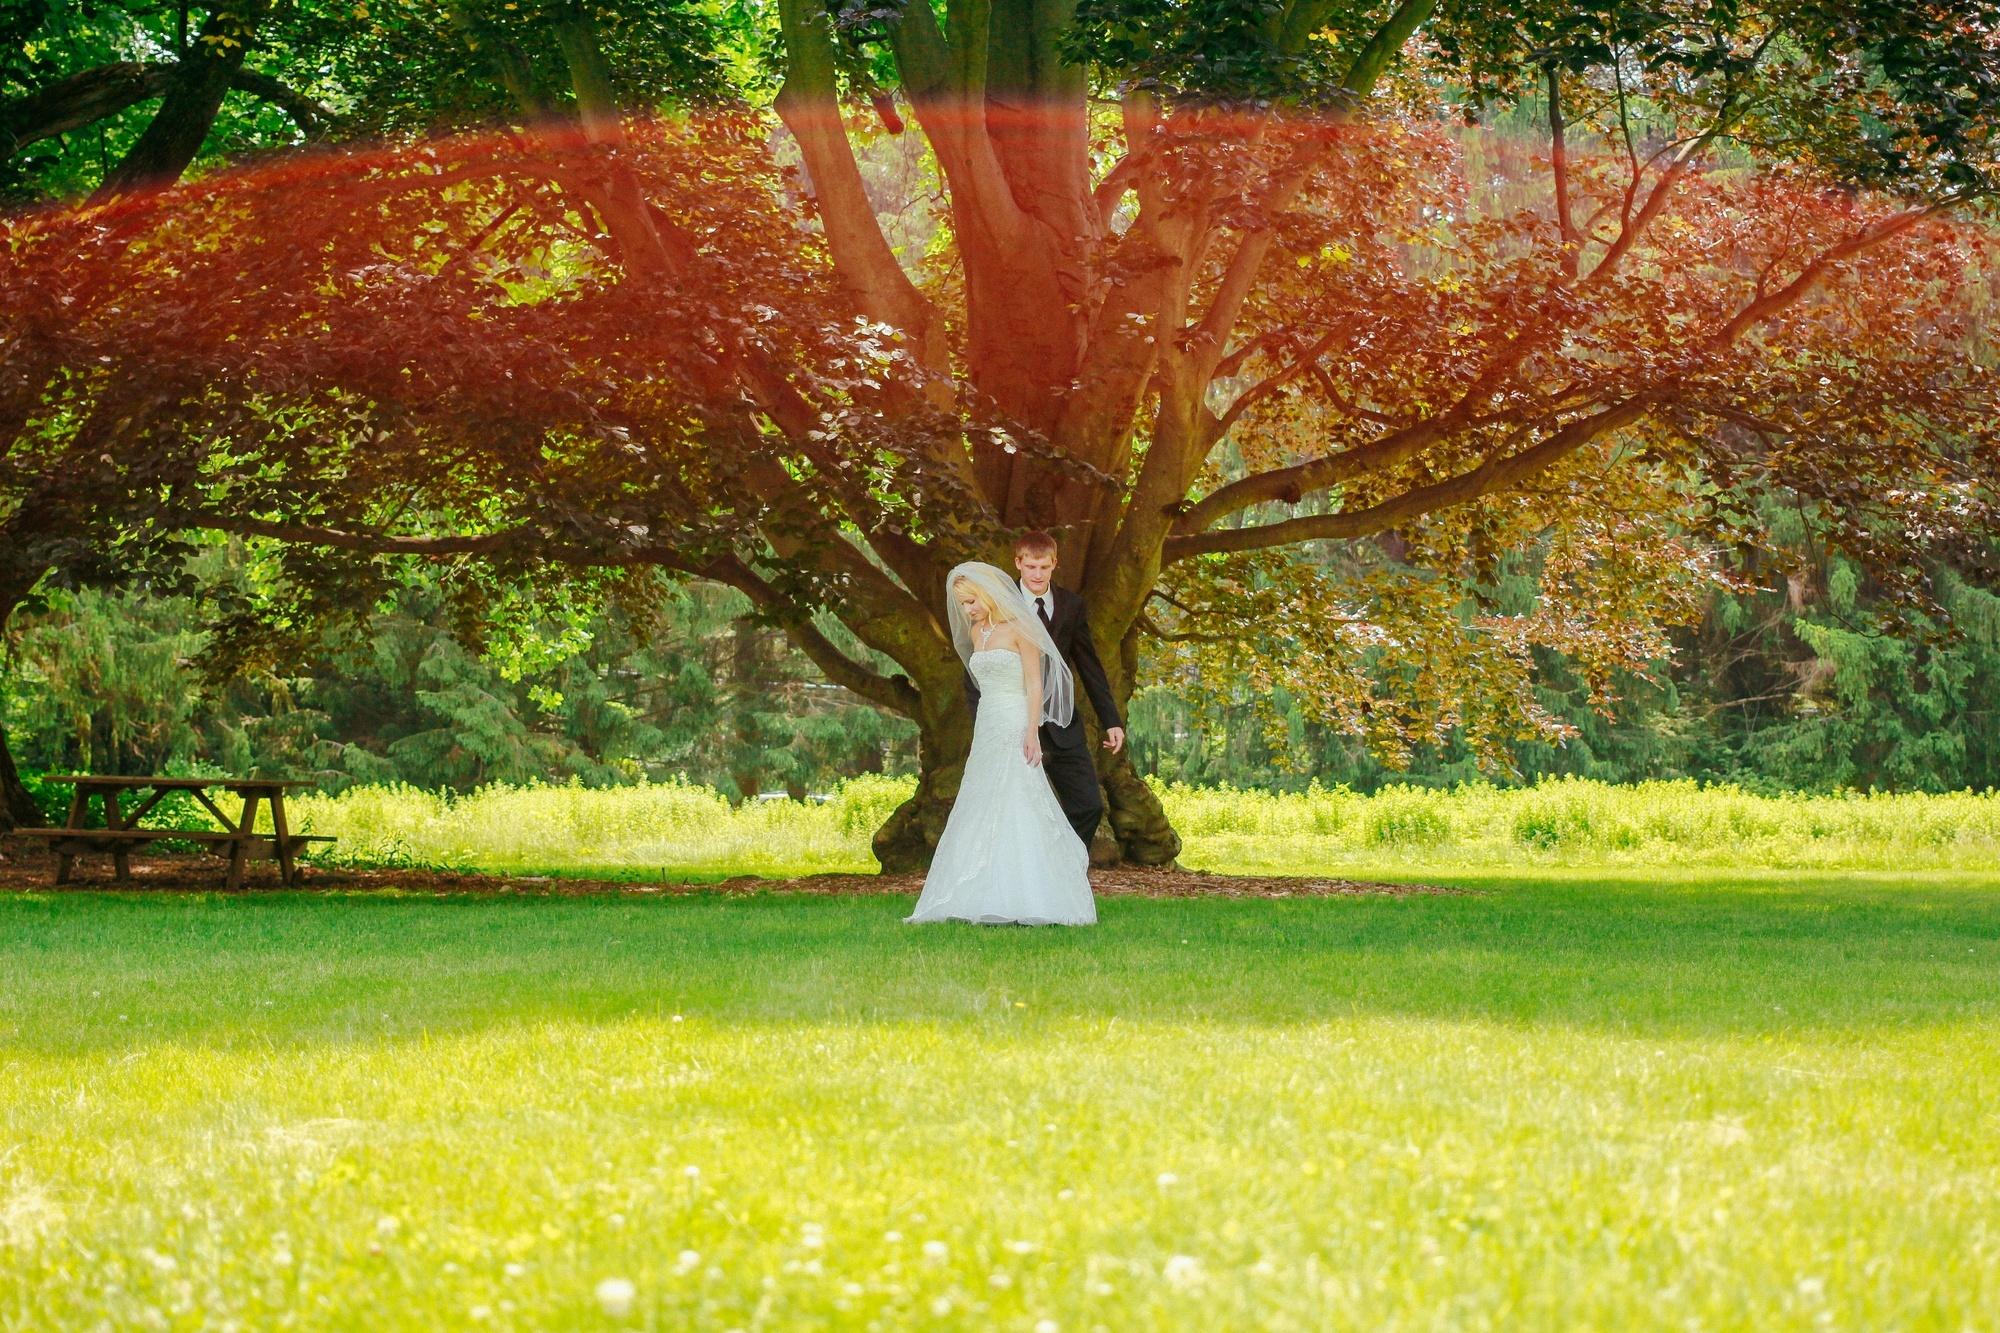 Monica.Justesen.Photography.Creative.Wedding.Photographer.Massachusetts.23.jpg